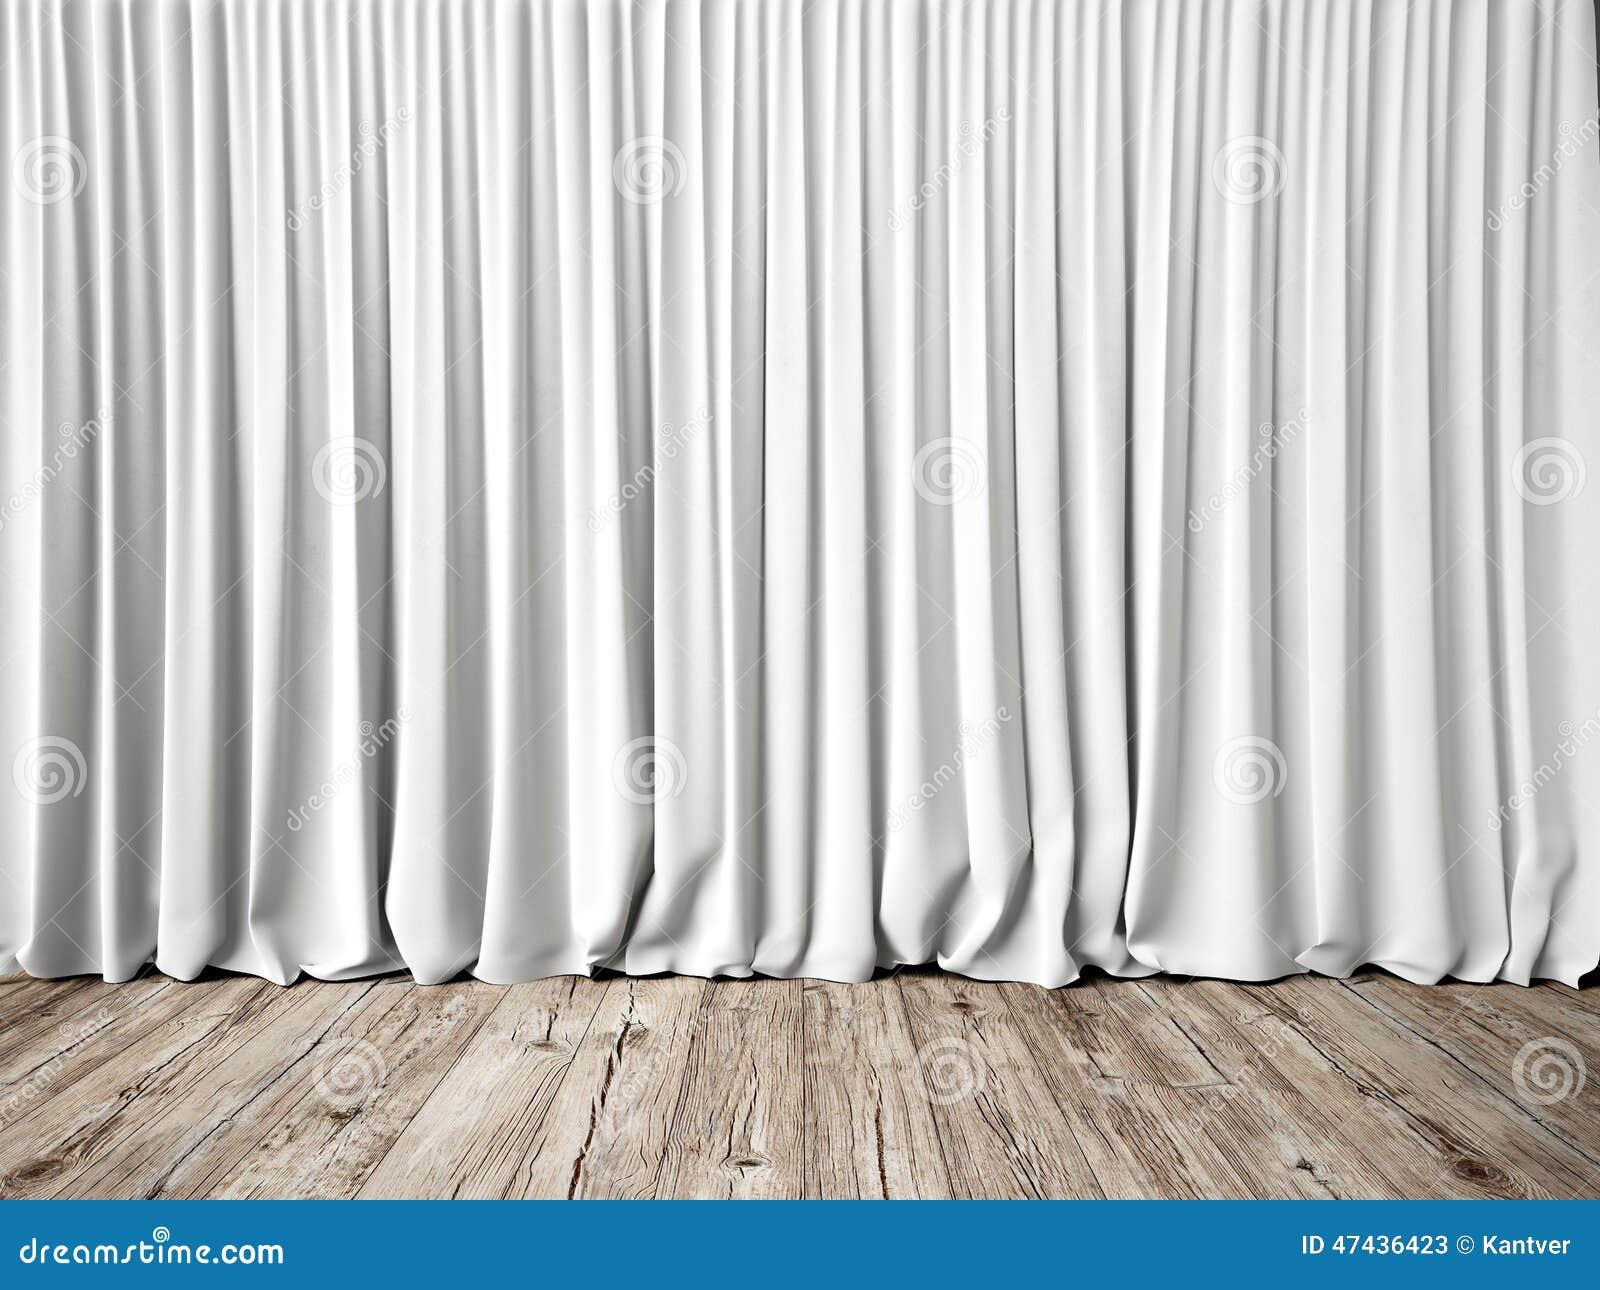 https://thumbs.dreamstime.com/z/witte-gordijnen-en-houten-vloer-47436423.jpg